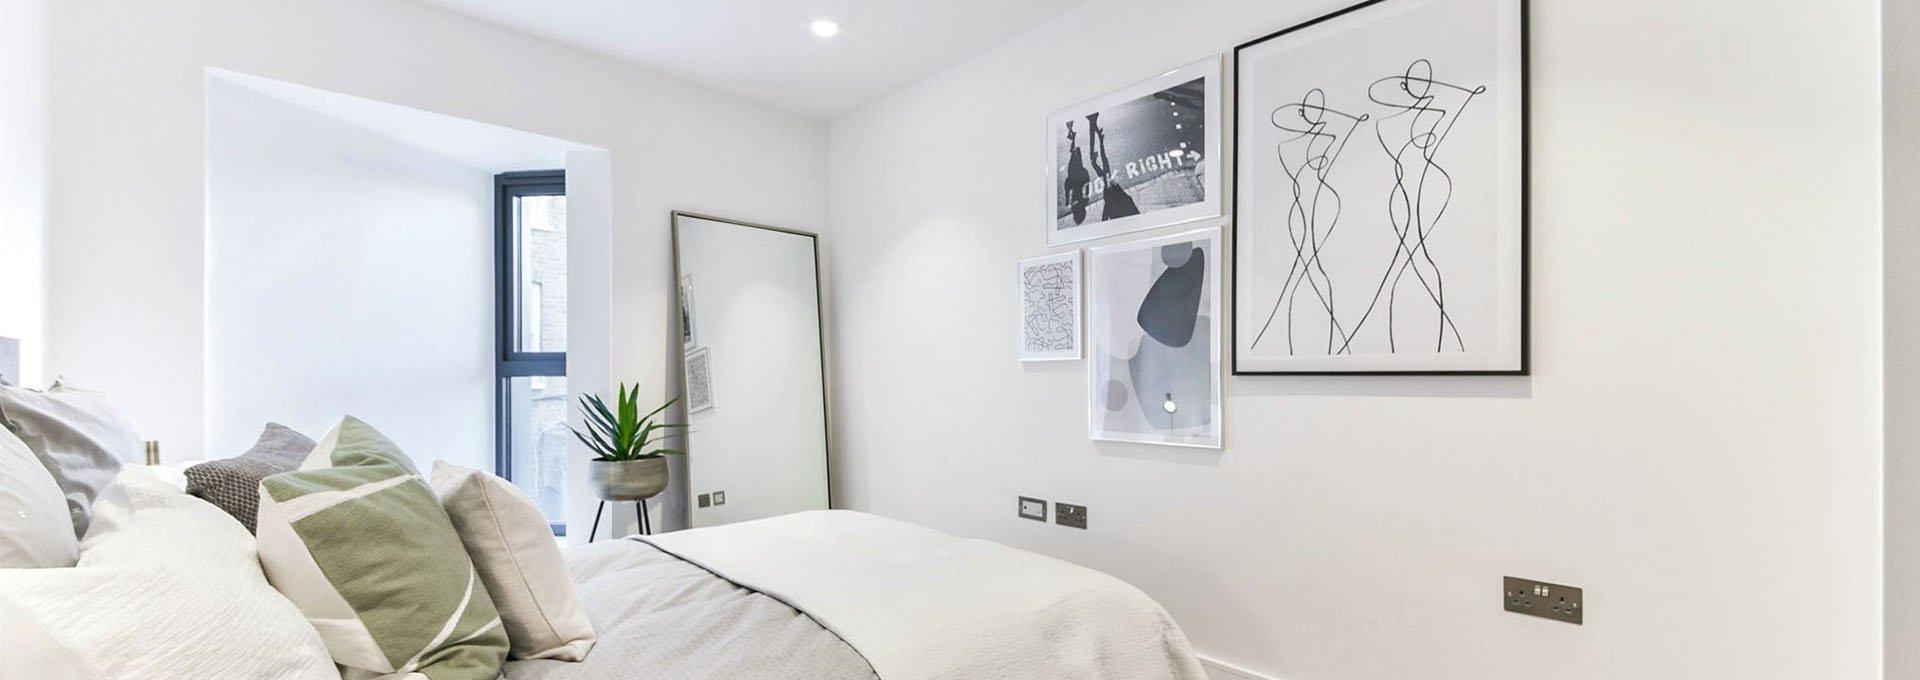 Offley Road Bedroom Architecture